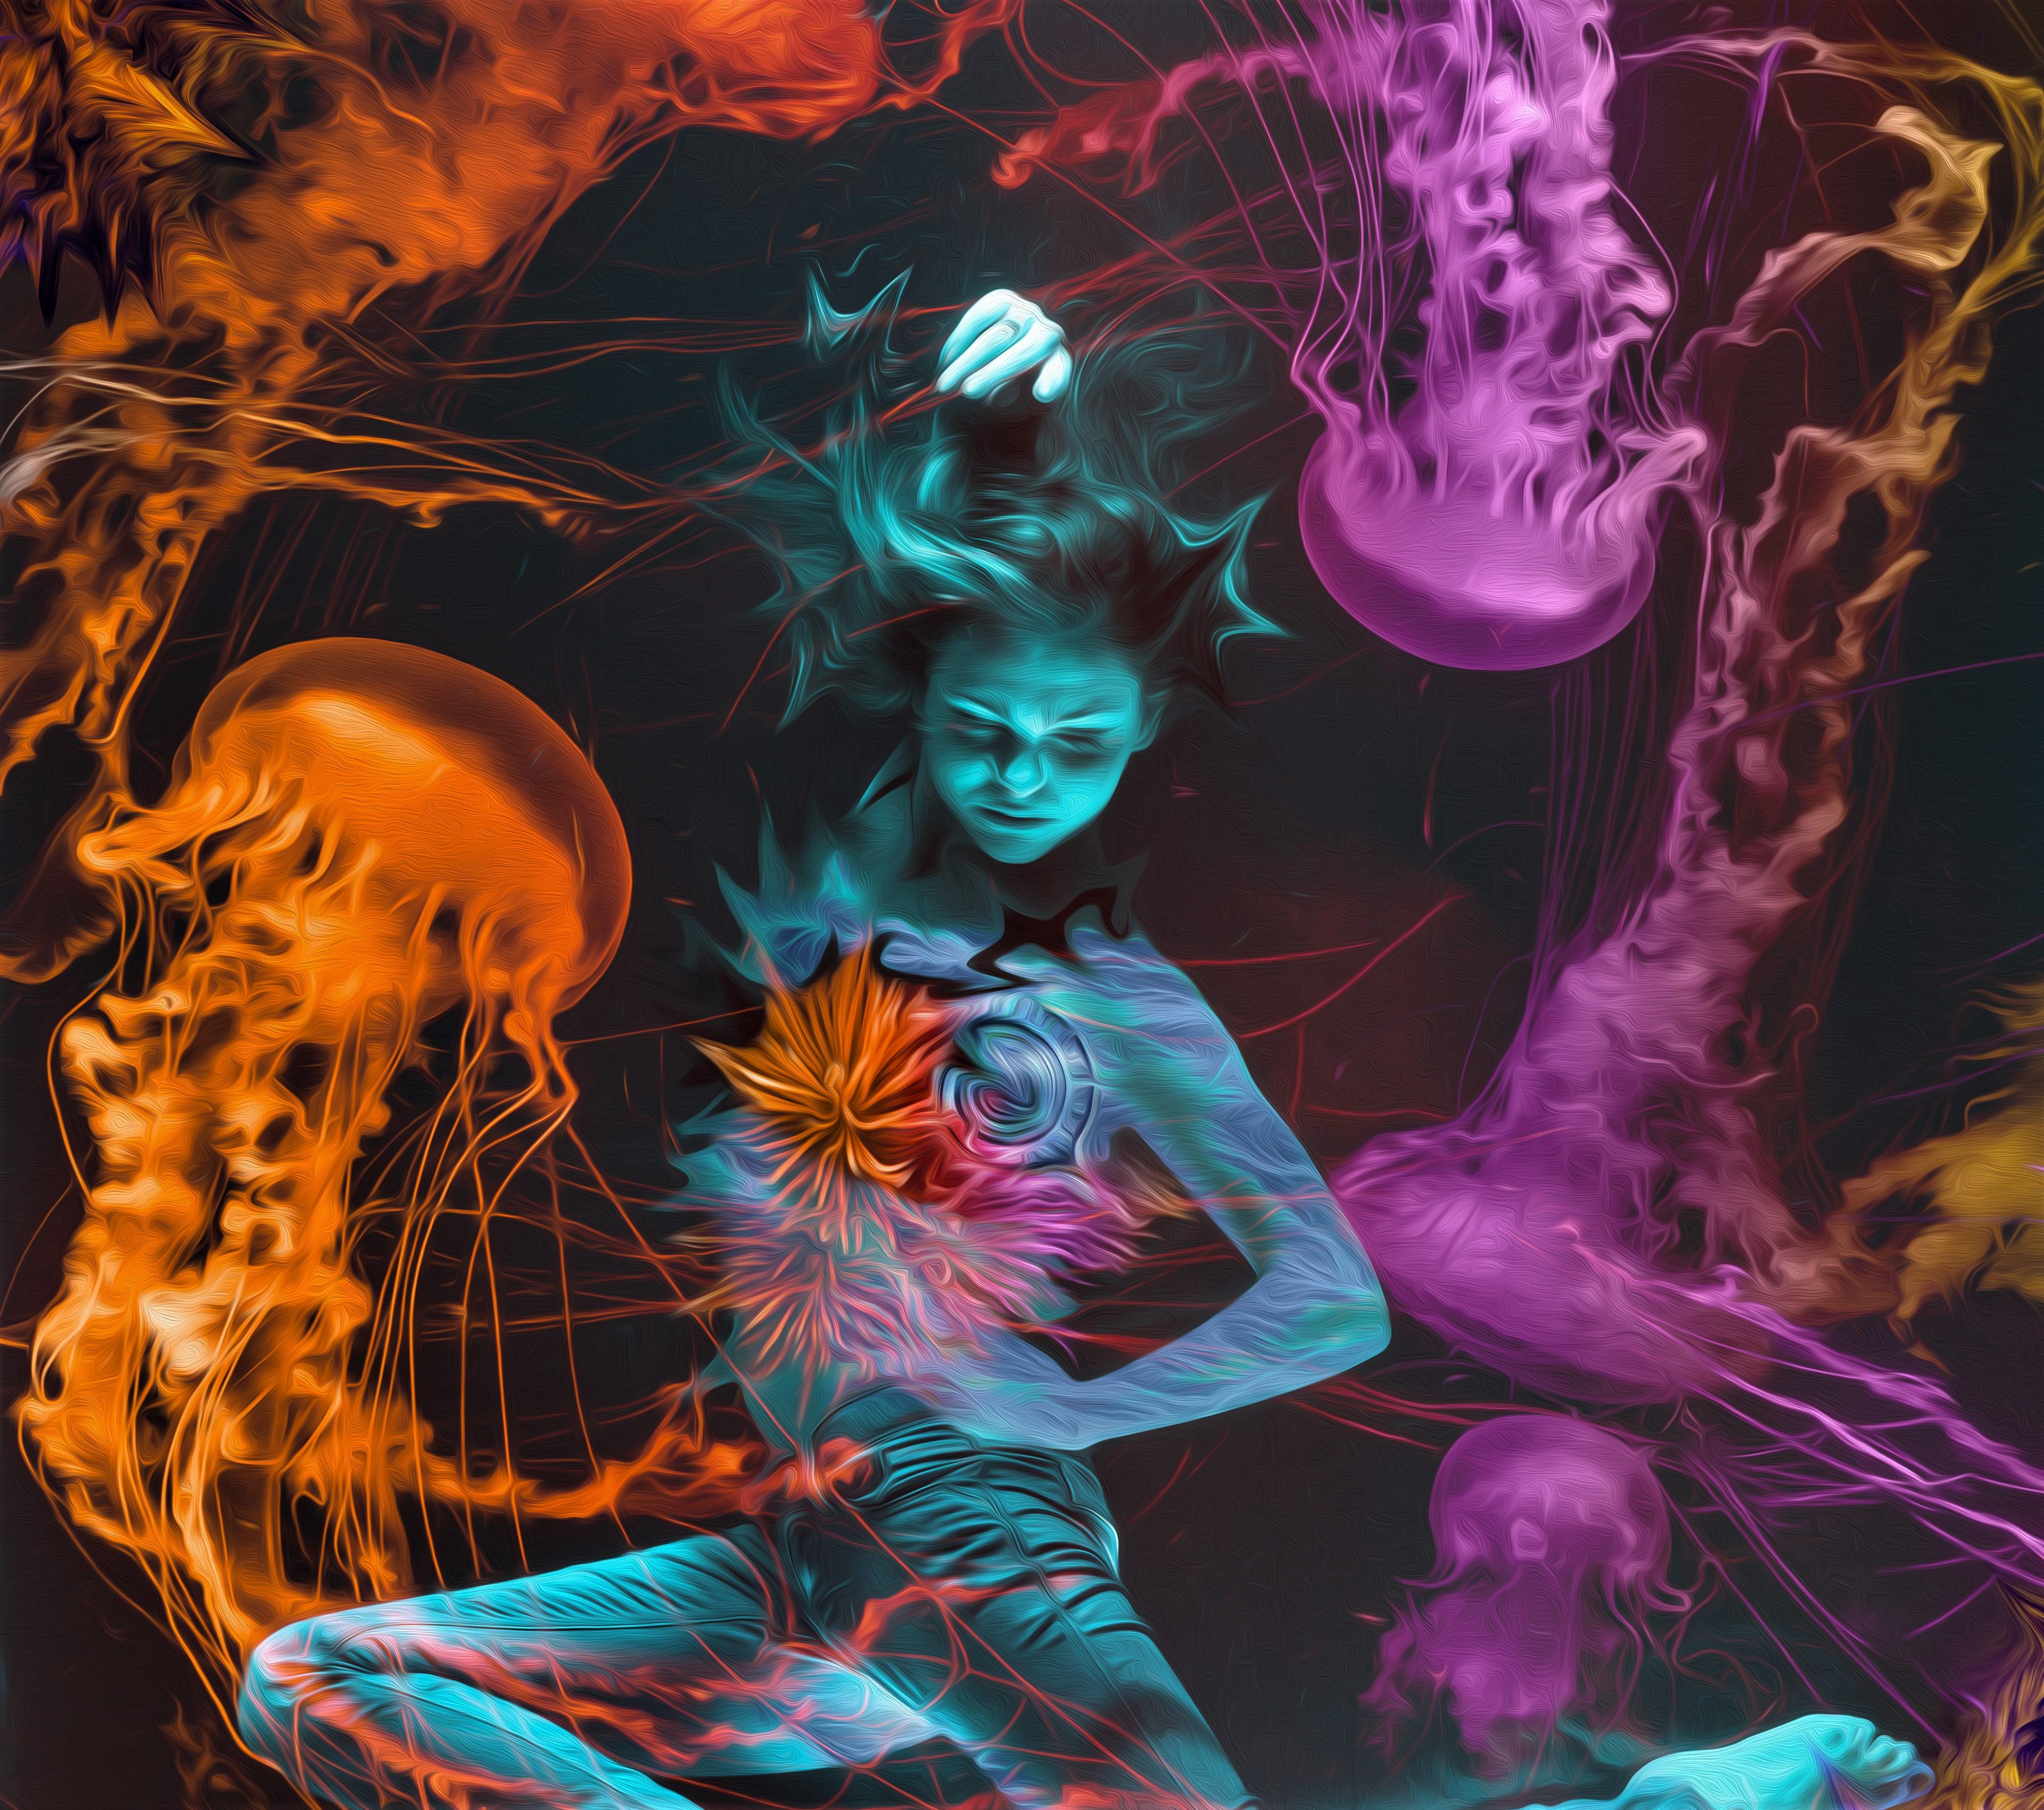 Neon Mermaid 4k Ultra Hd Wallpaper Background Image 3840x3400 Id 952596 Wallpaper Abyss